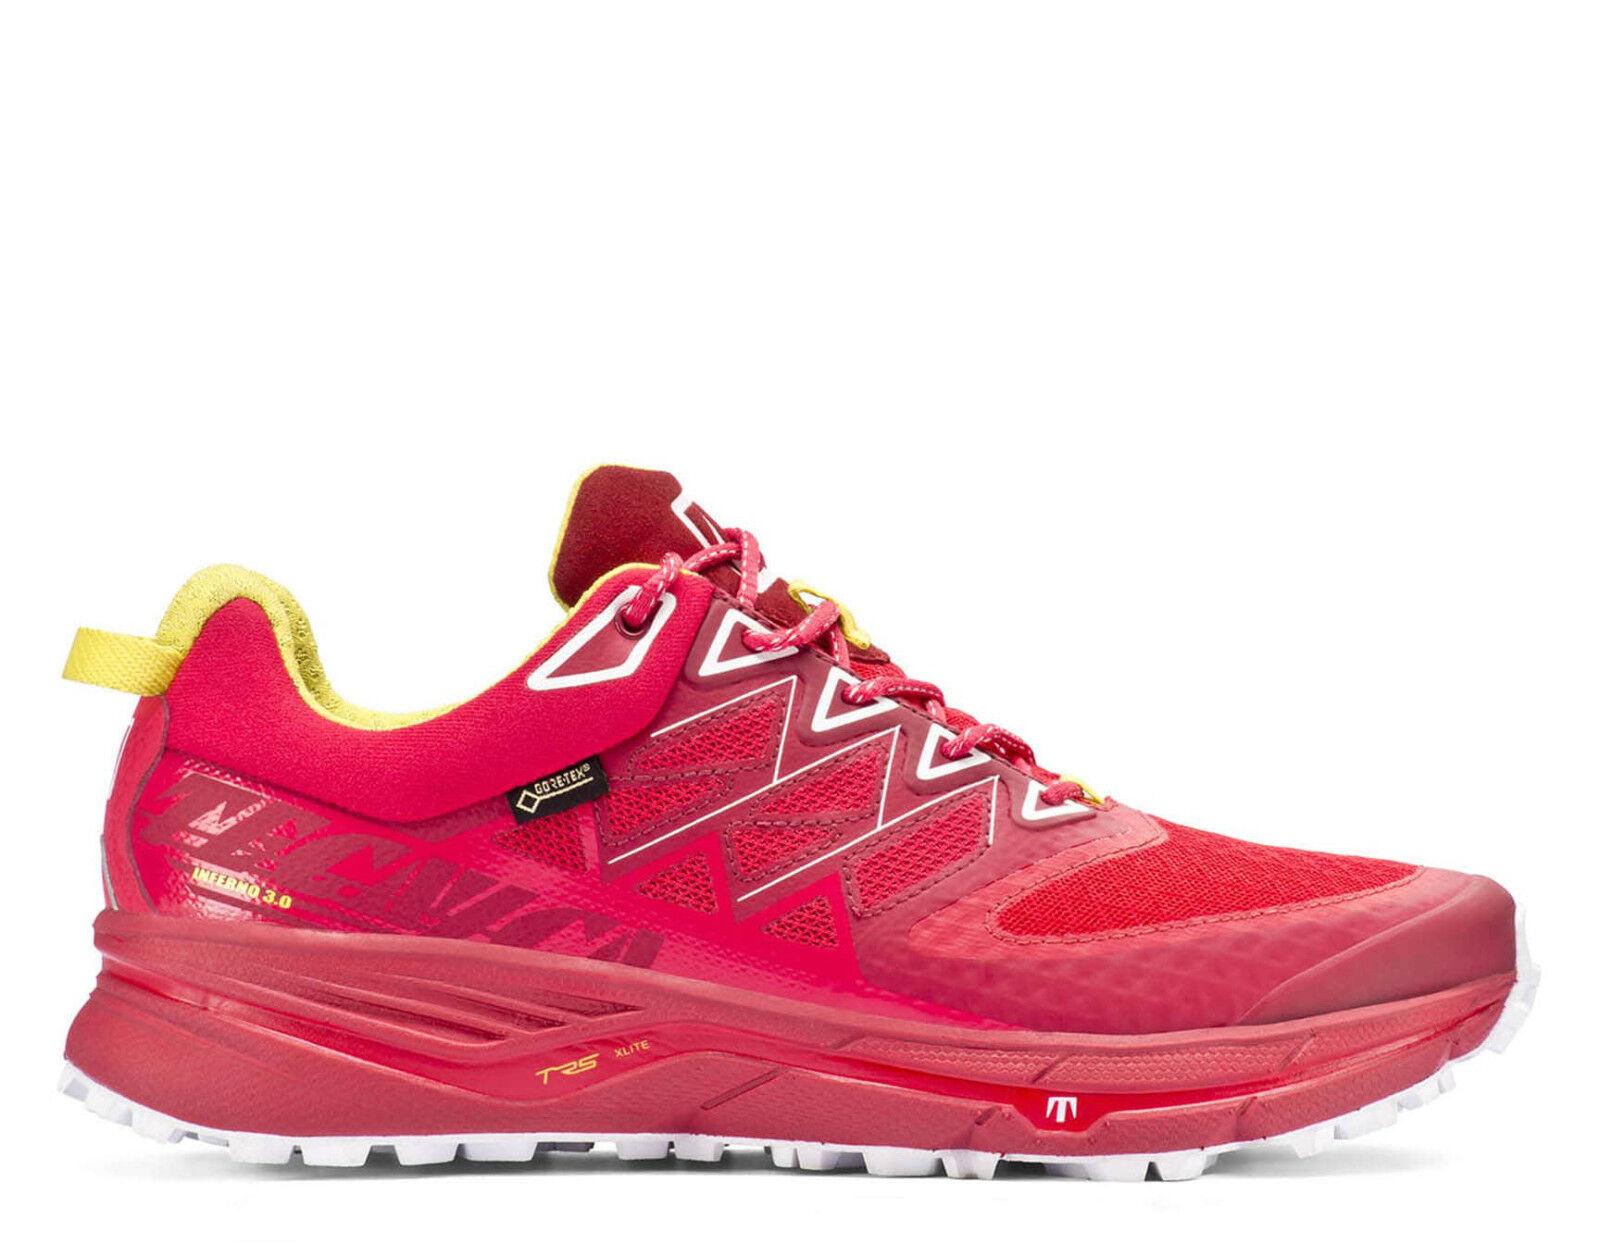 Tecnica trailschuh Inferno Xlite 3.0 Size 38 EU  US 7 shoes Pink Womens MN j18  factory direct sales